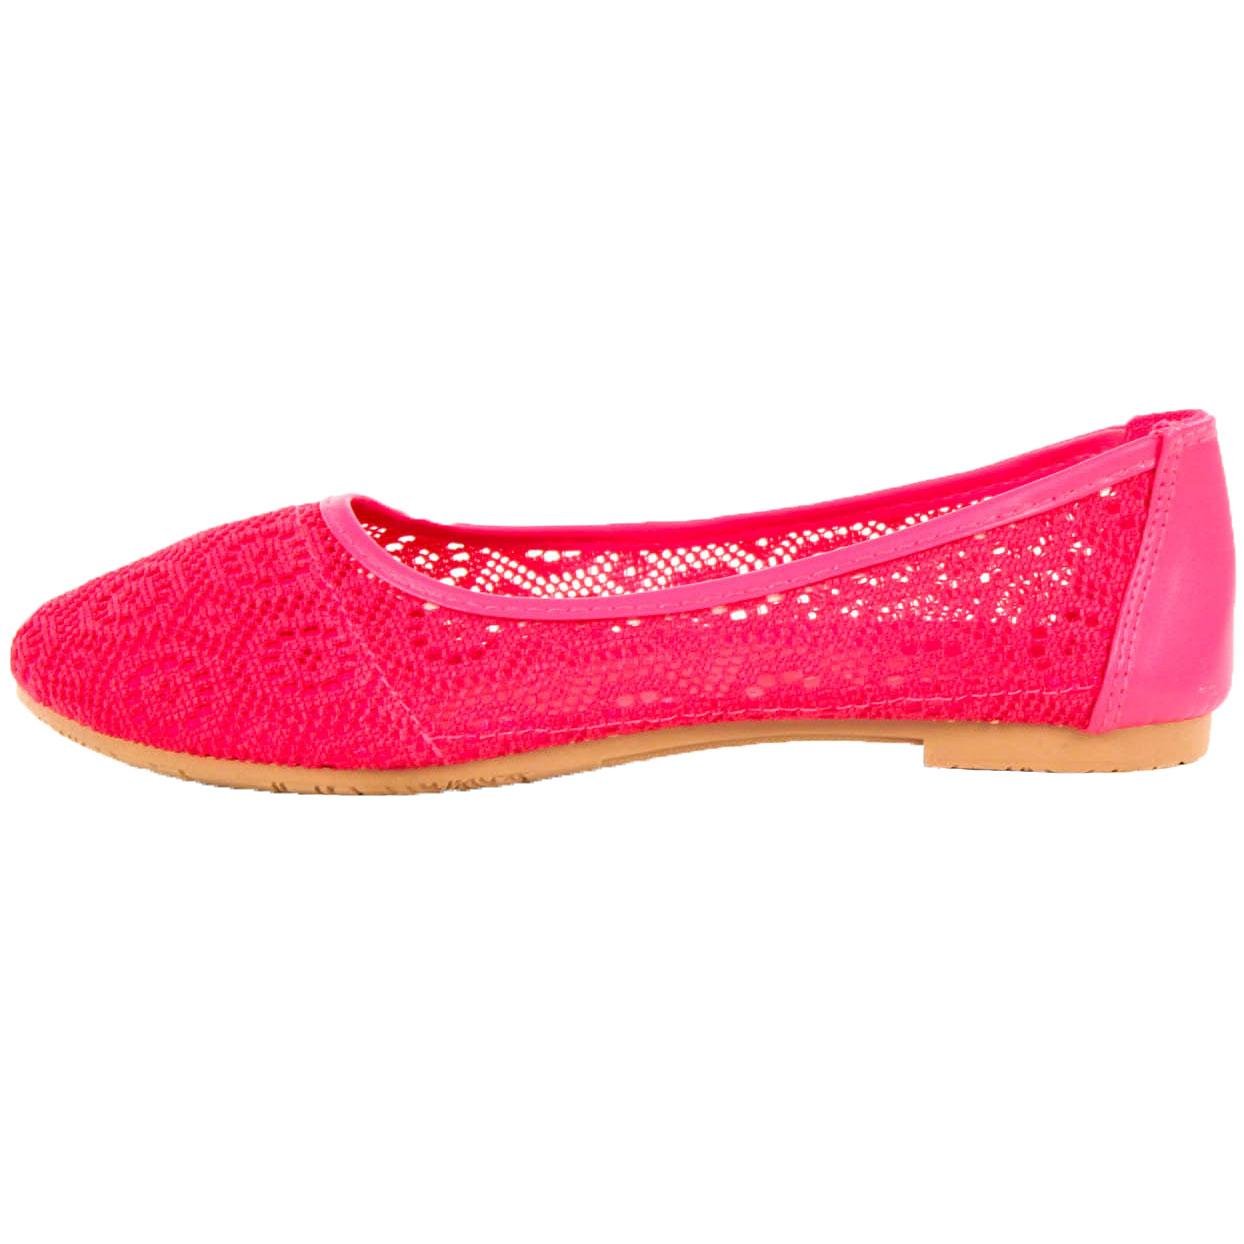 Womens Lace Ballet Flats Mesh Crochet Slip On Casual Shoes